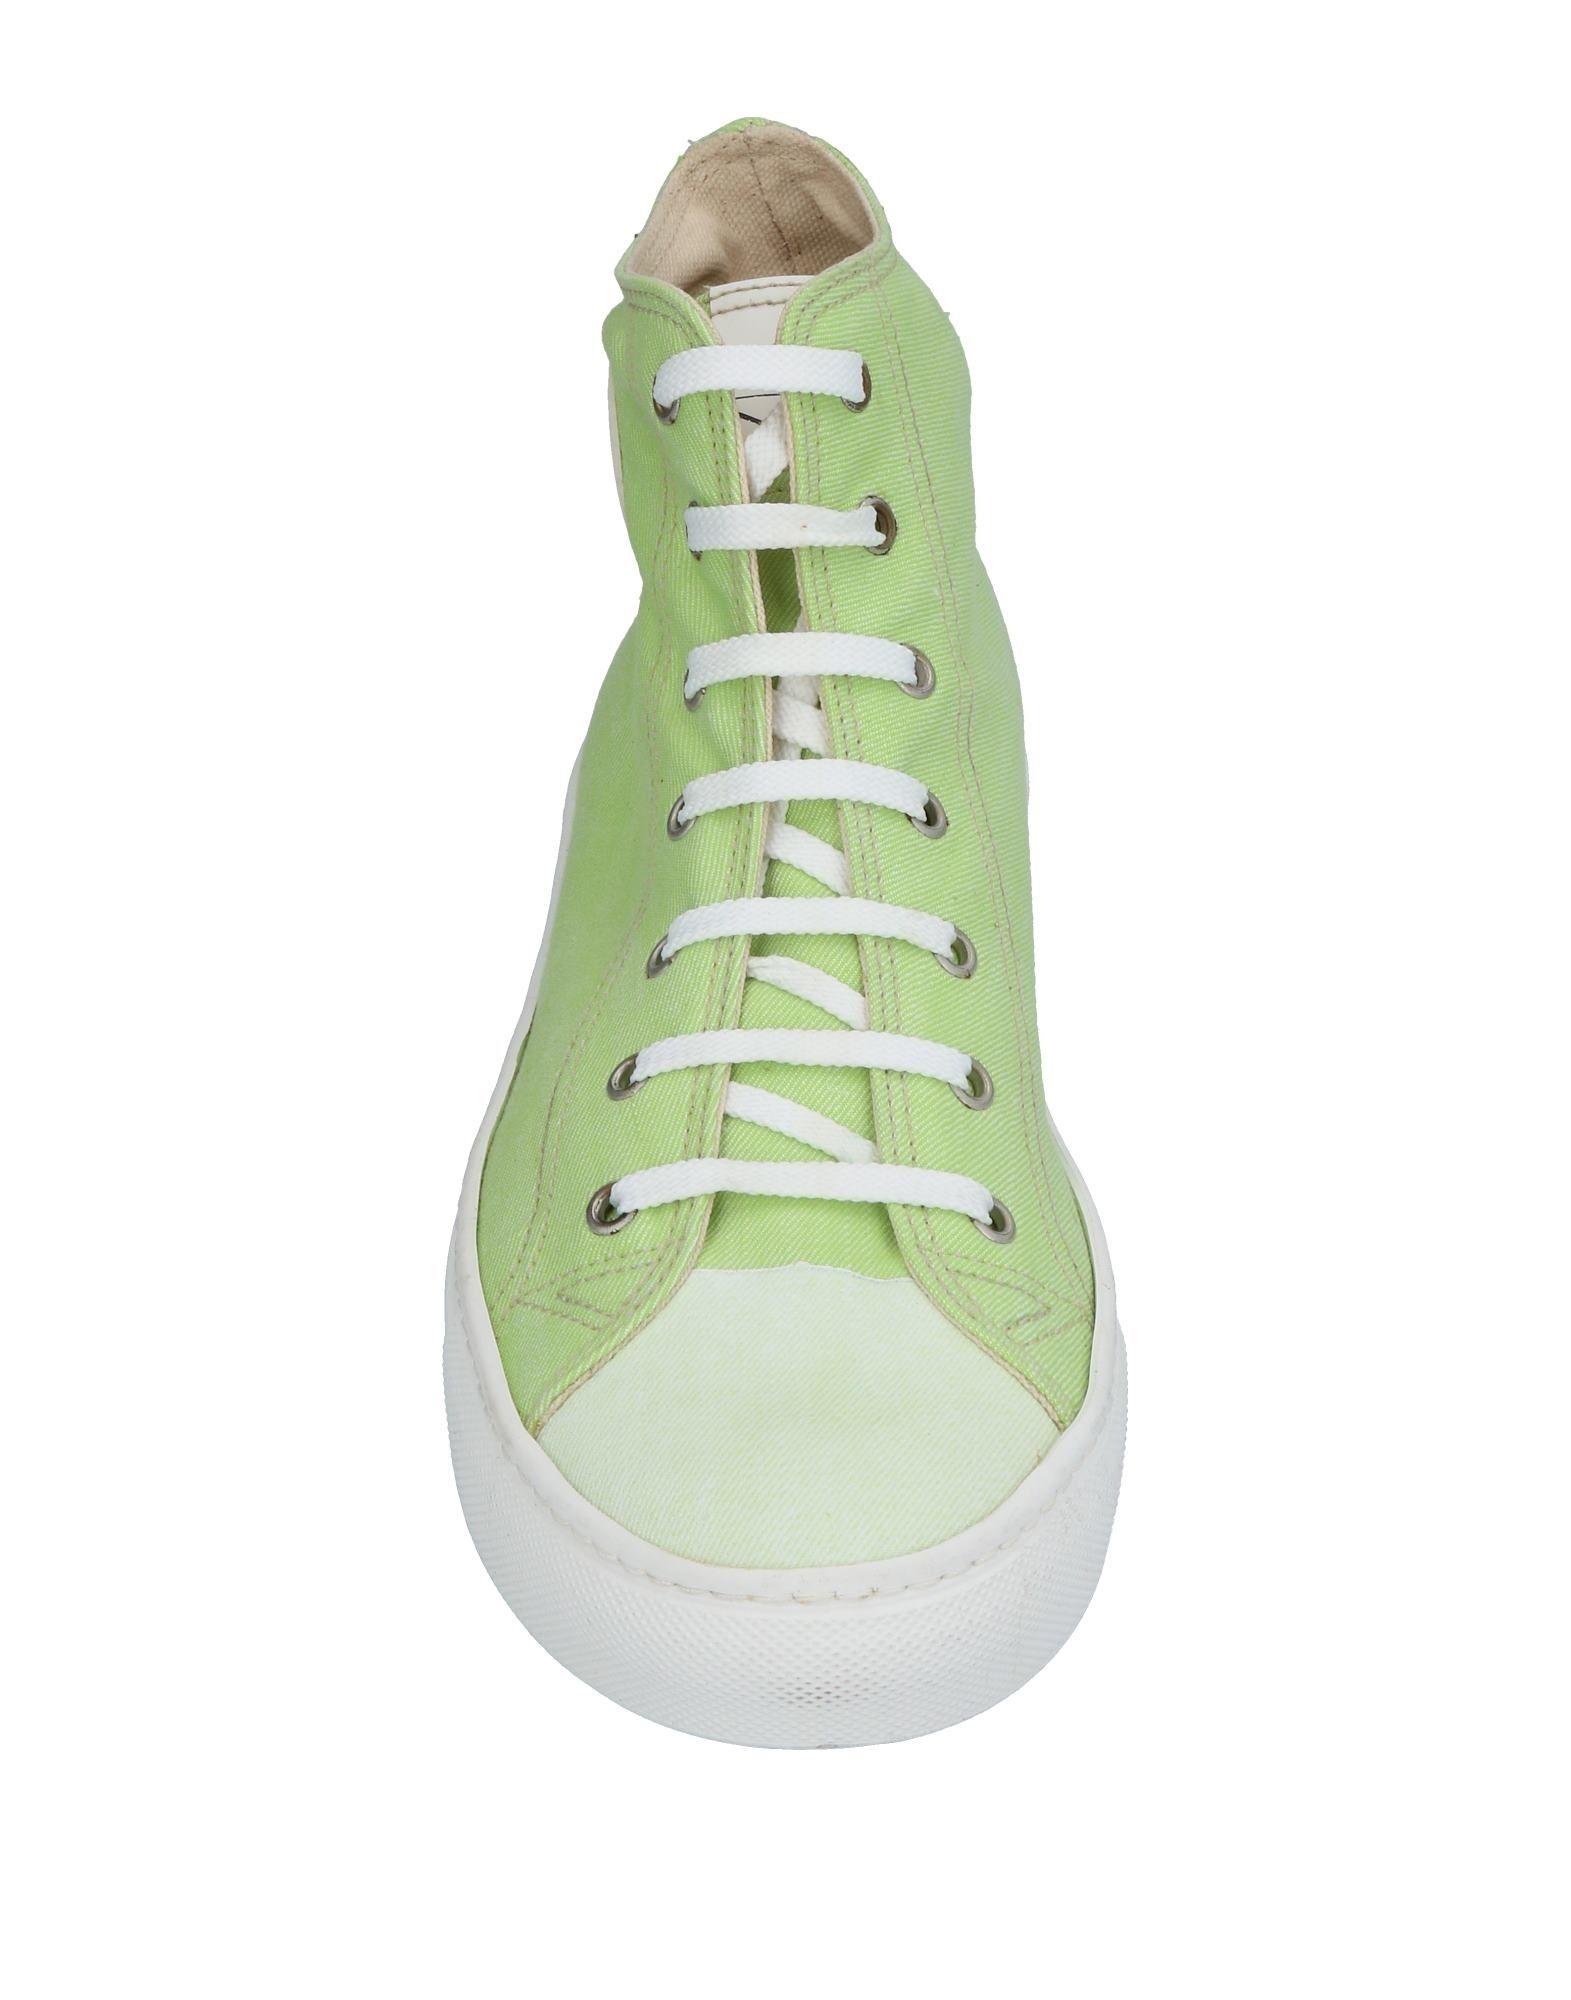 Sneakers Roÿ Rogers Homme - Sneakers Roÿ Rogers sur ...